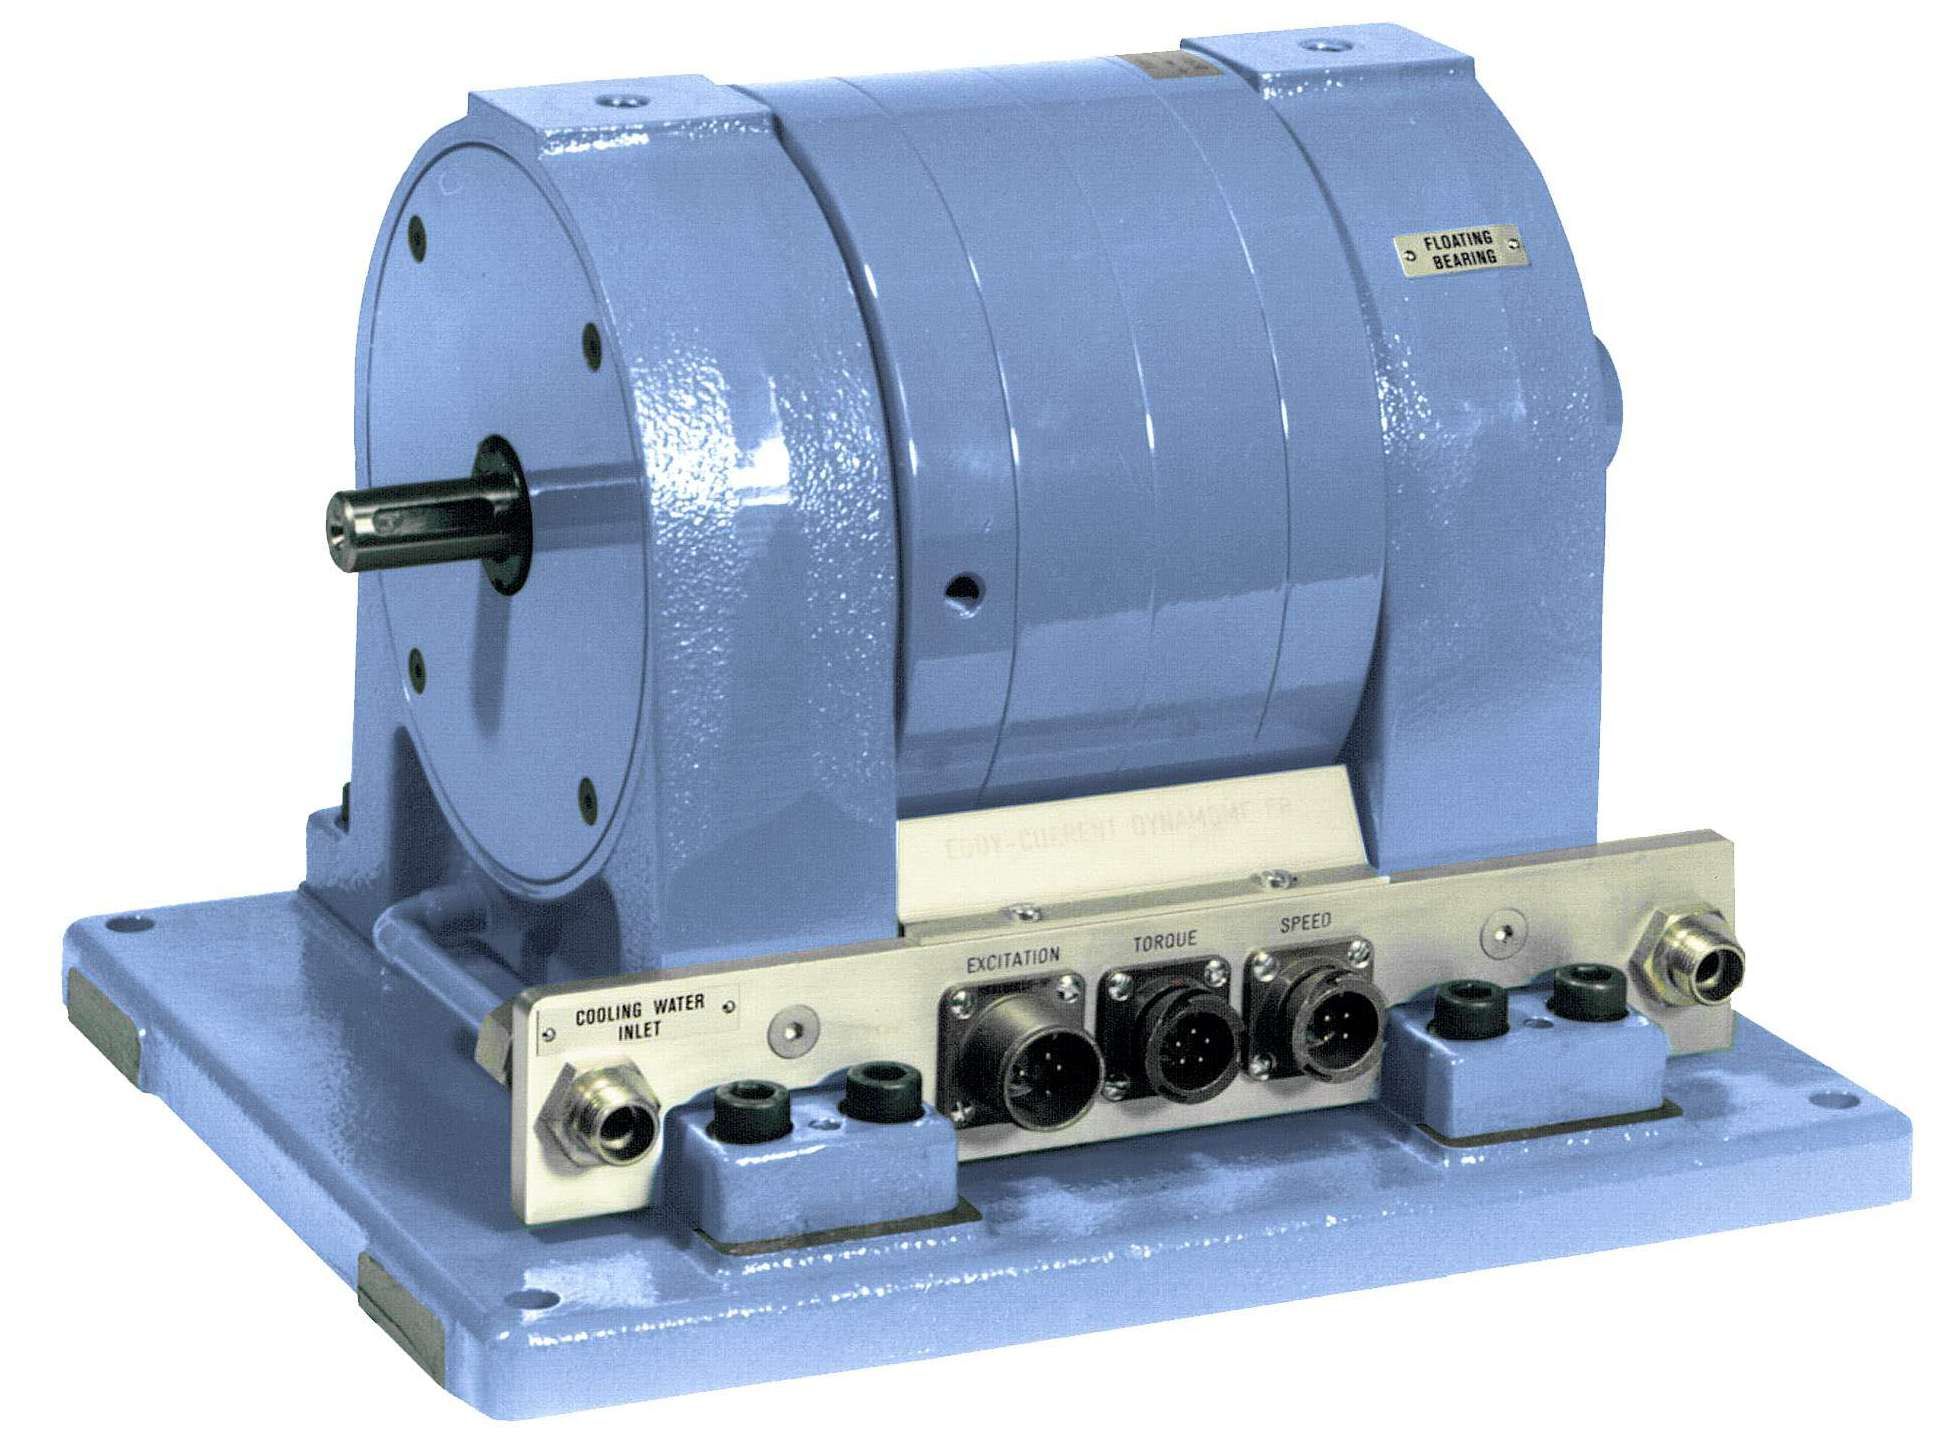 Dynamometers Electric motor dynamometer testing